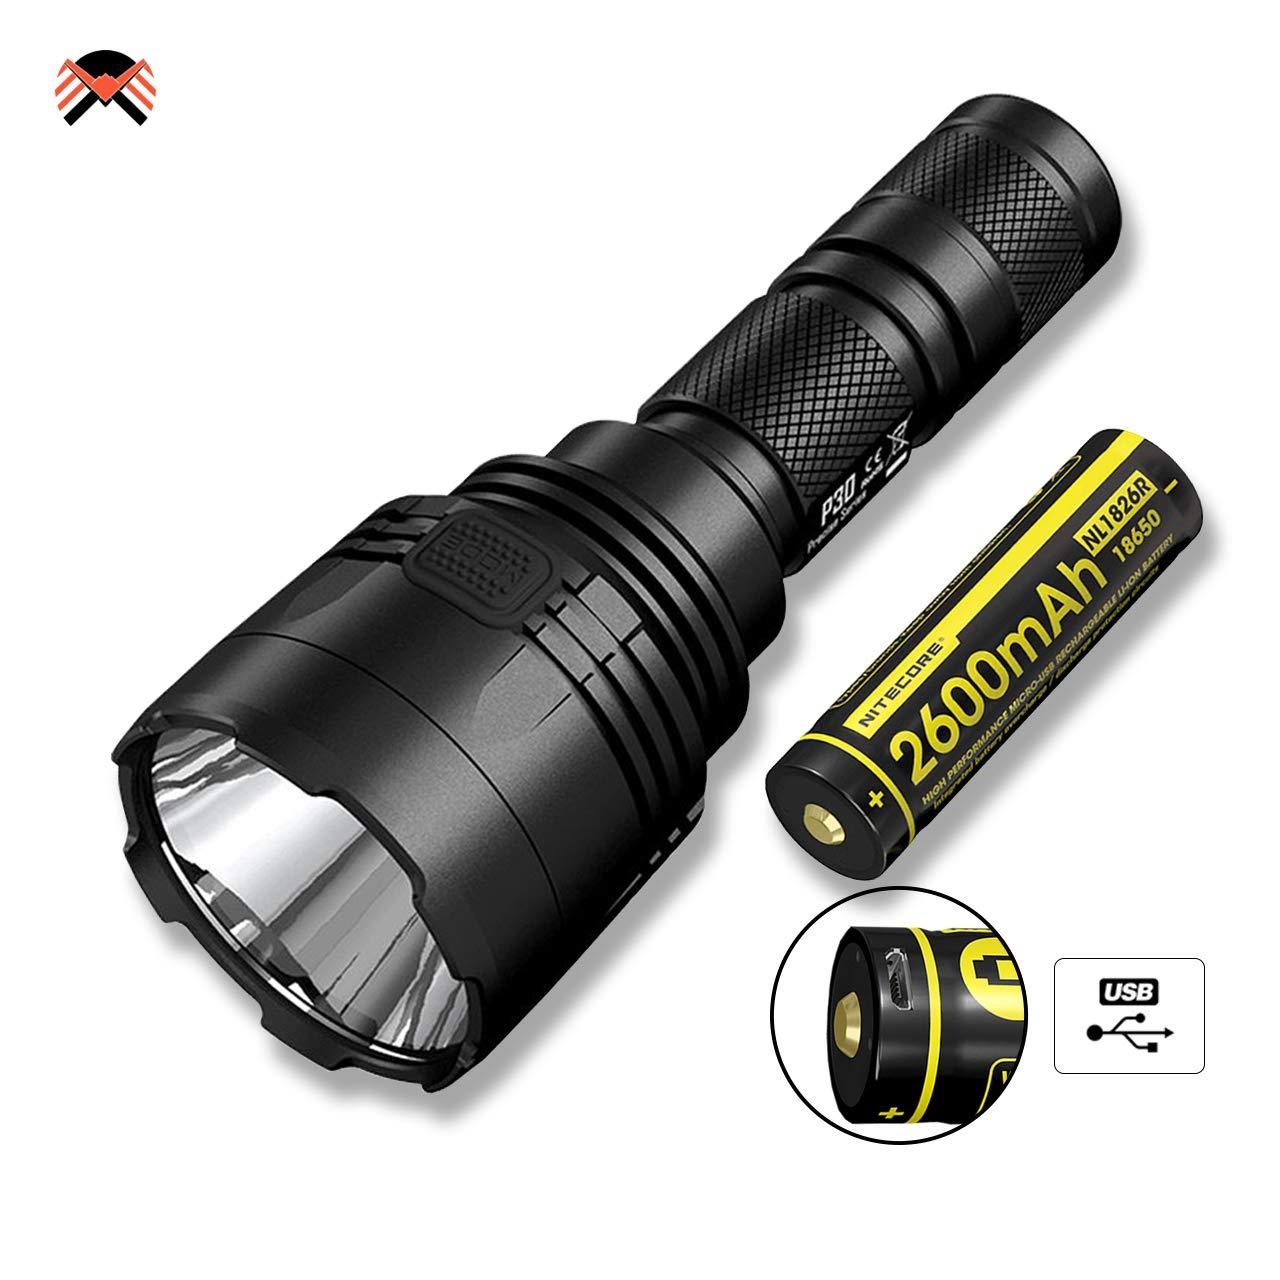 NITECORE P30 LINTERNA LED 1000 Lumenes 618M Distancia IPX8 Impermeable [ Baterí a Recargable USB 2600mAh INCLUIDA ]